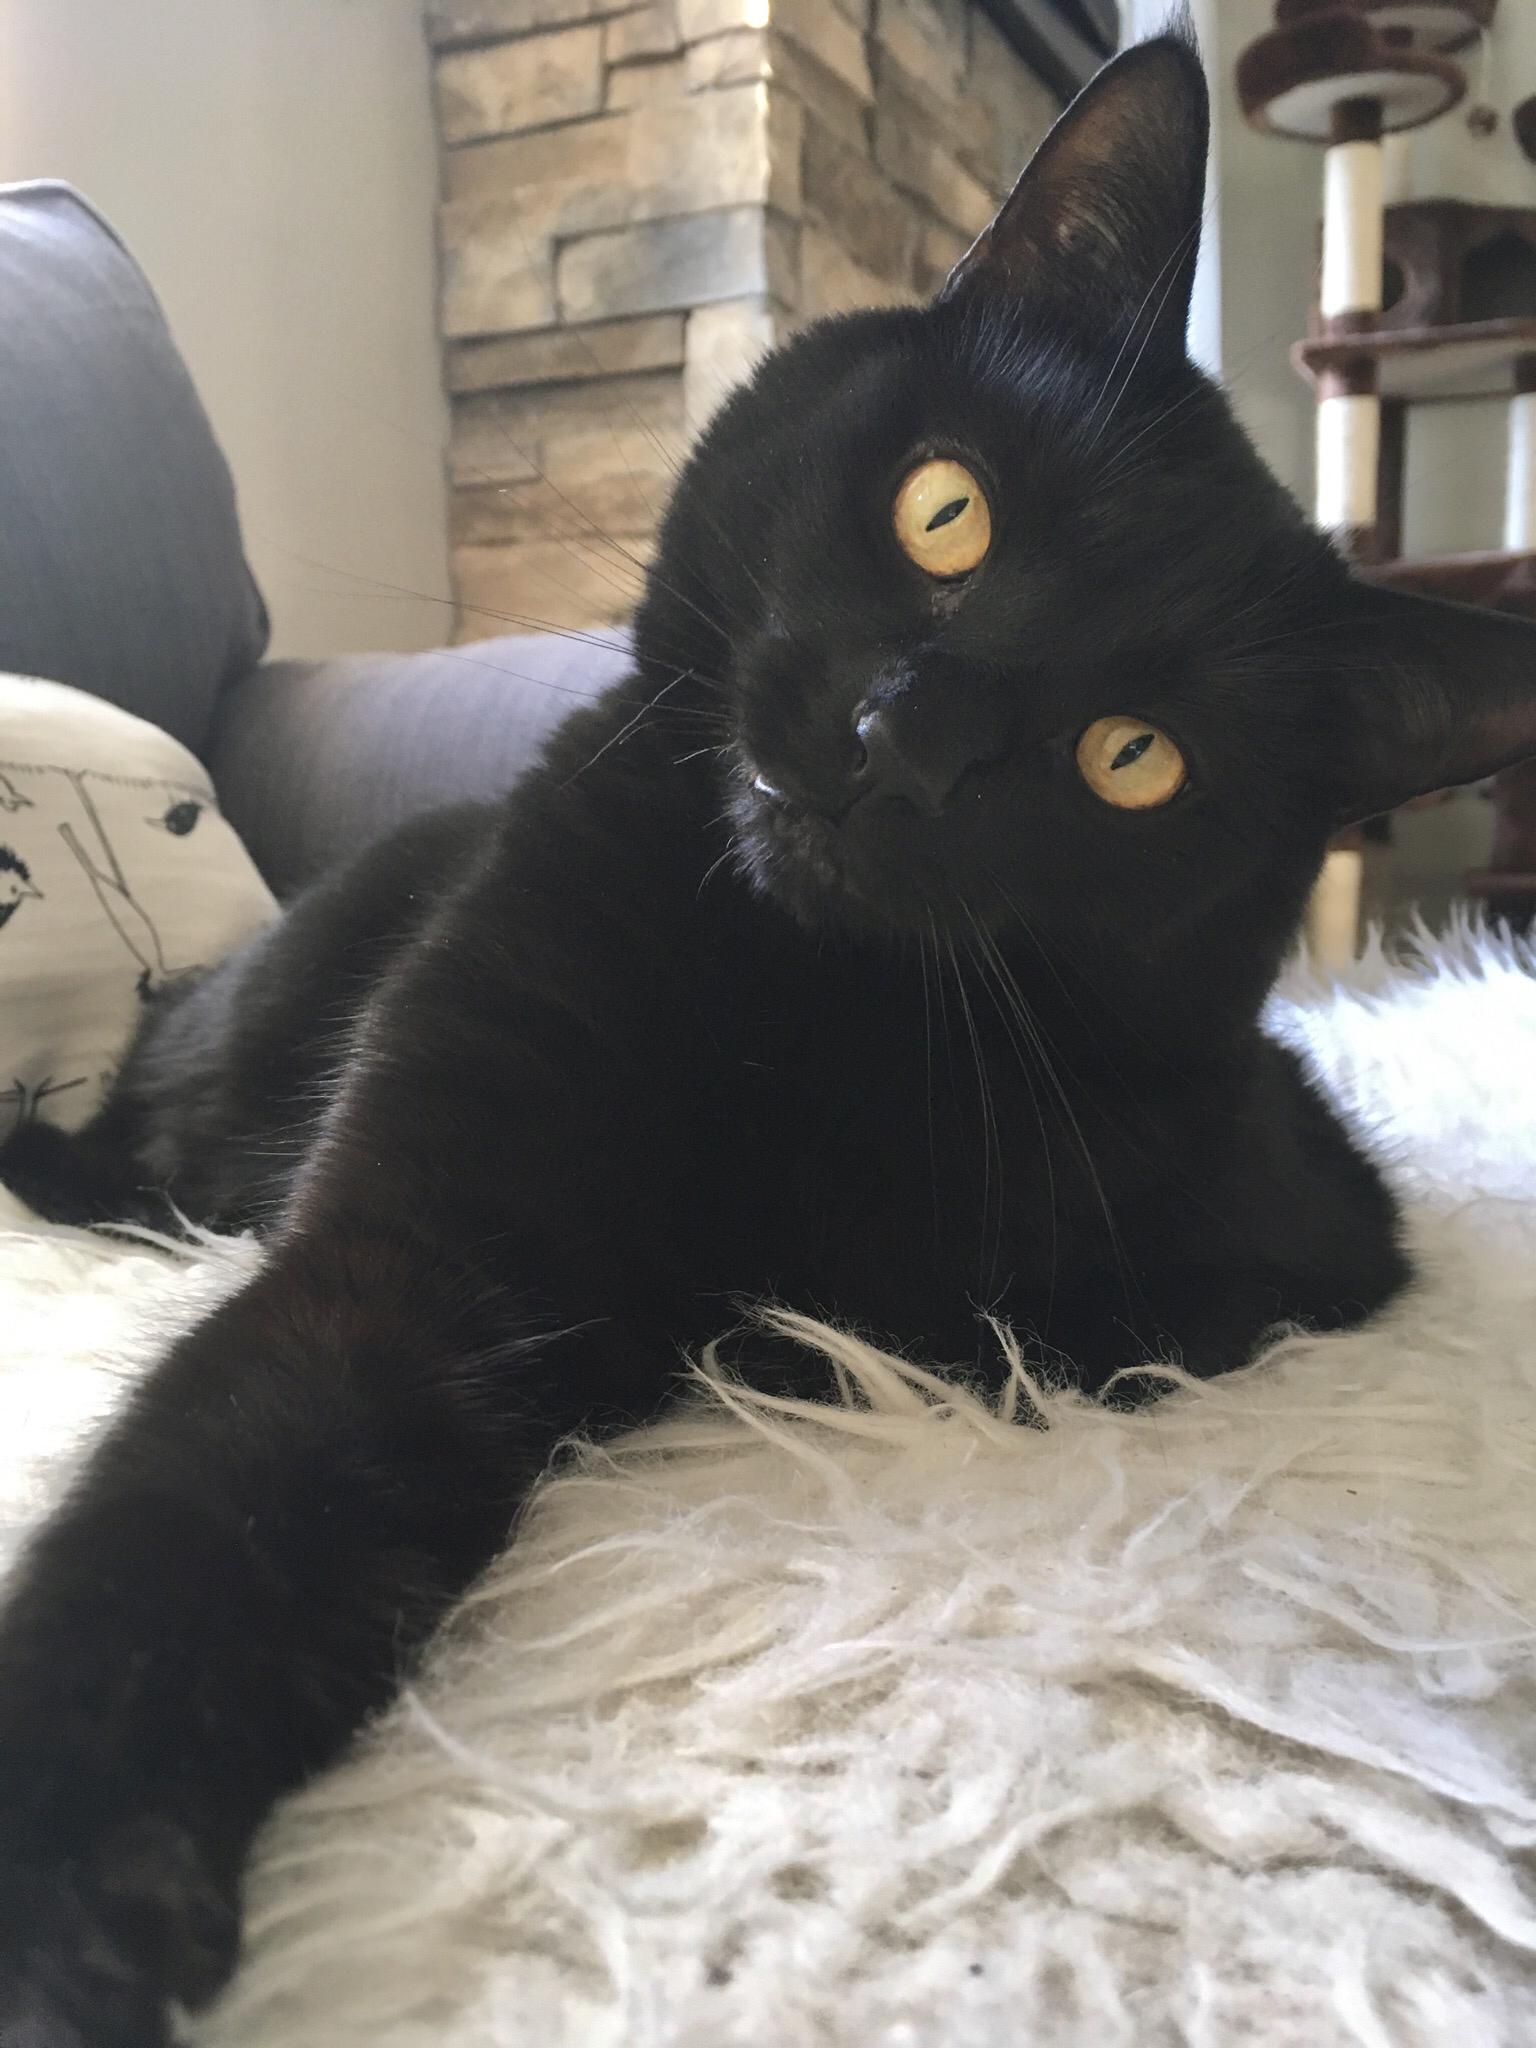 Black Cats Are Just So Beautiful Cats Black Cat Beautiful Cats